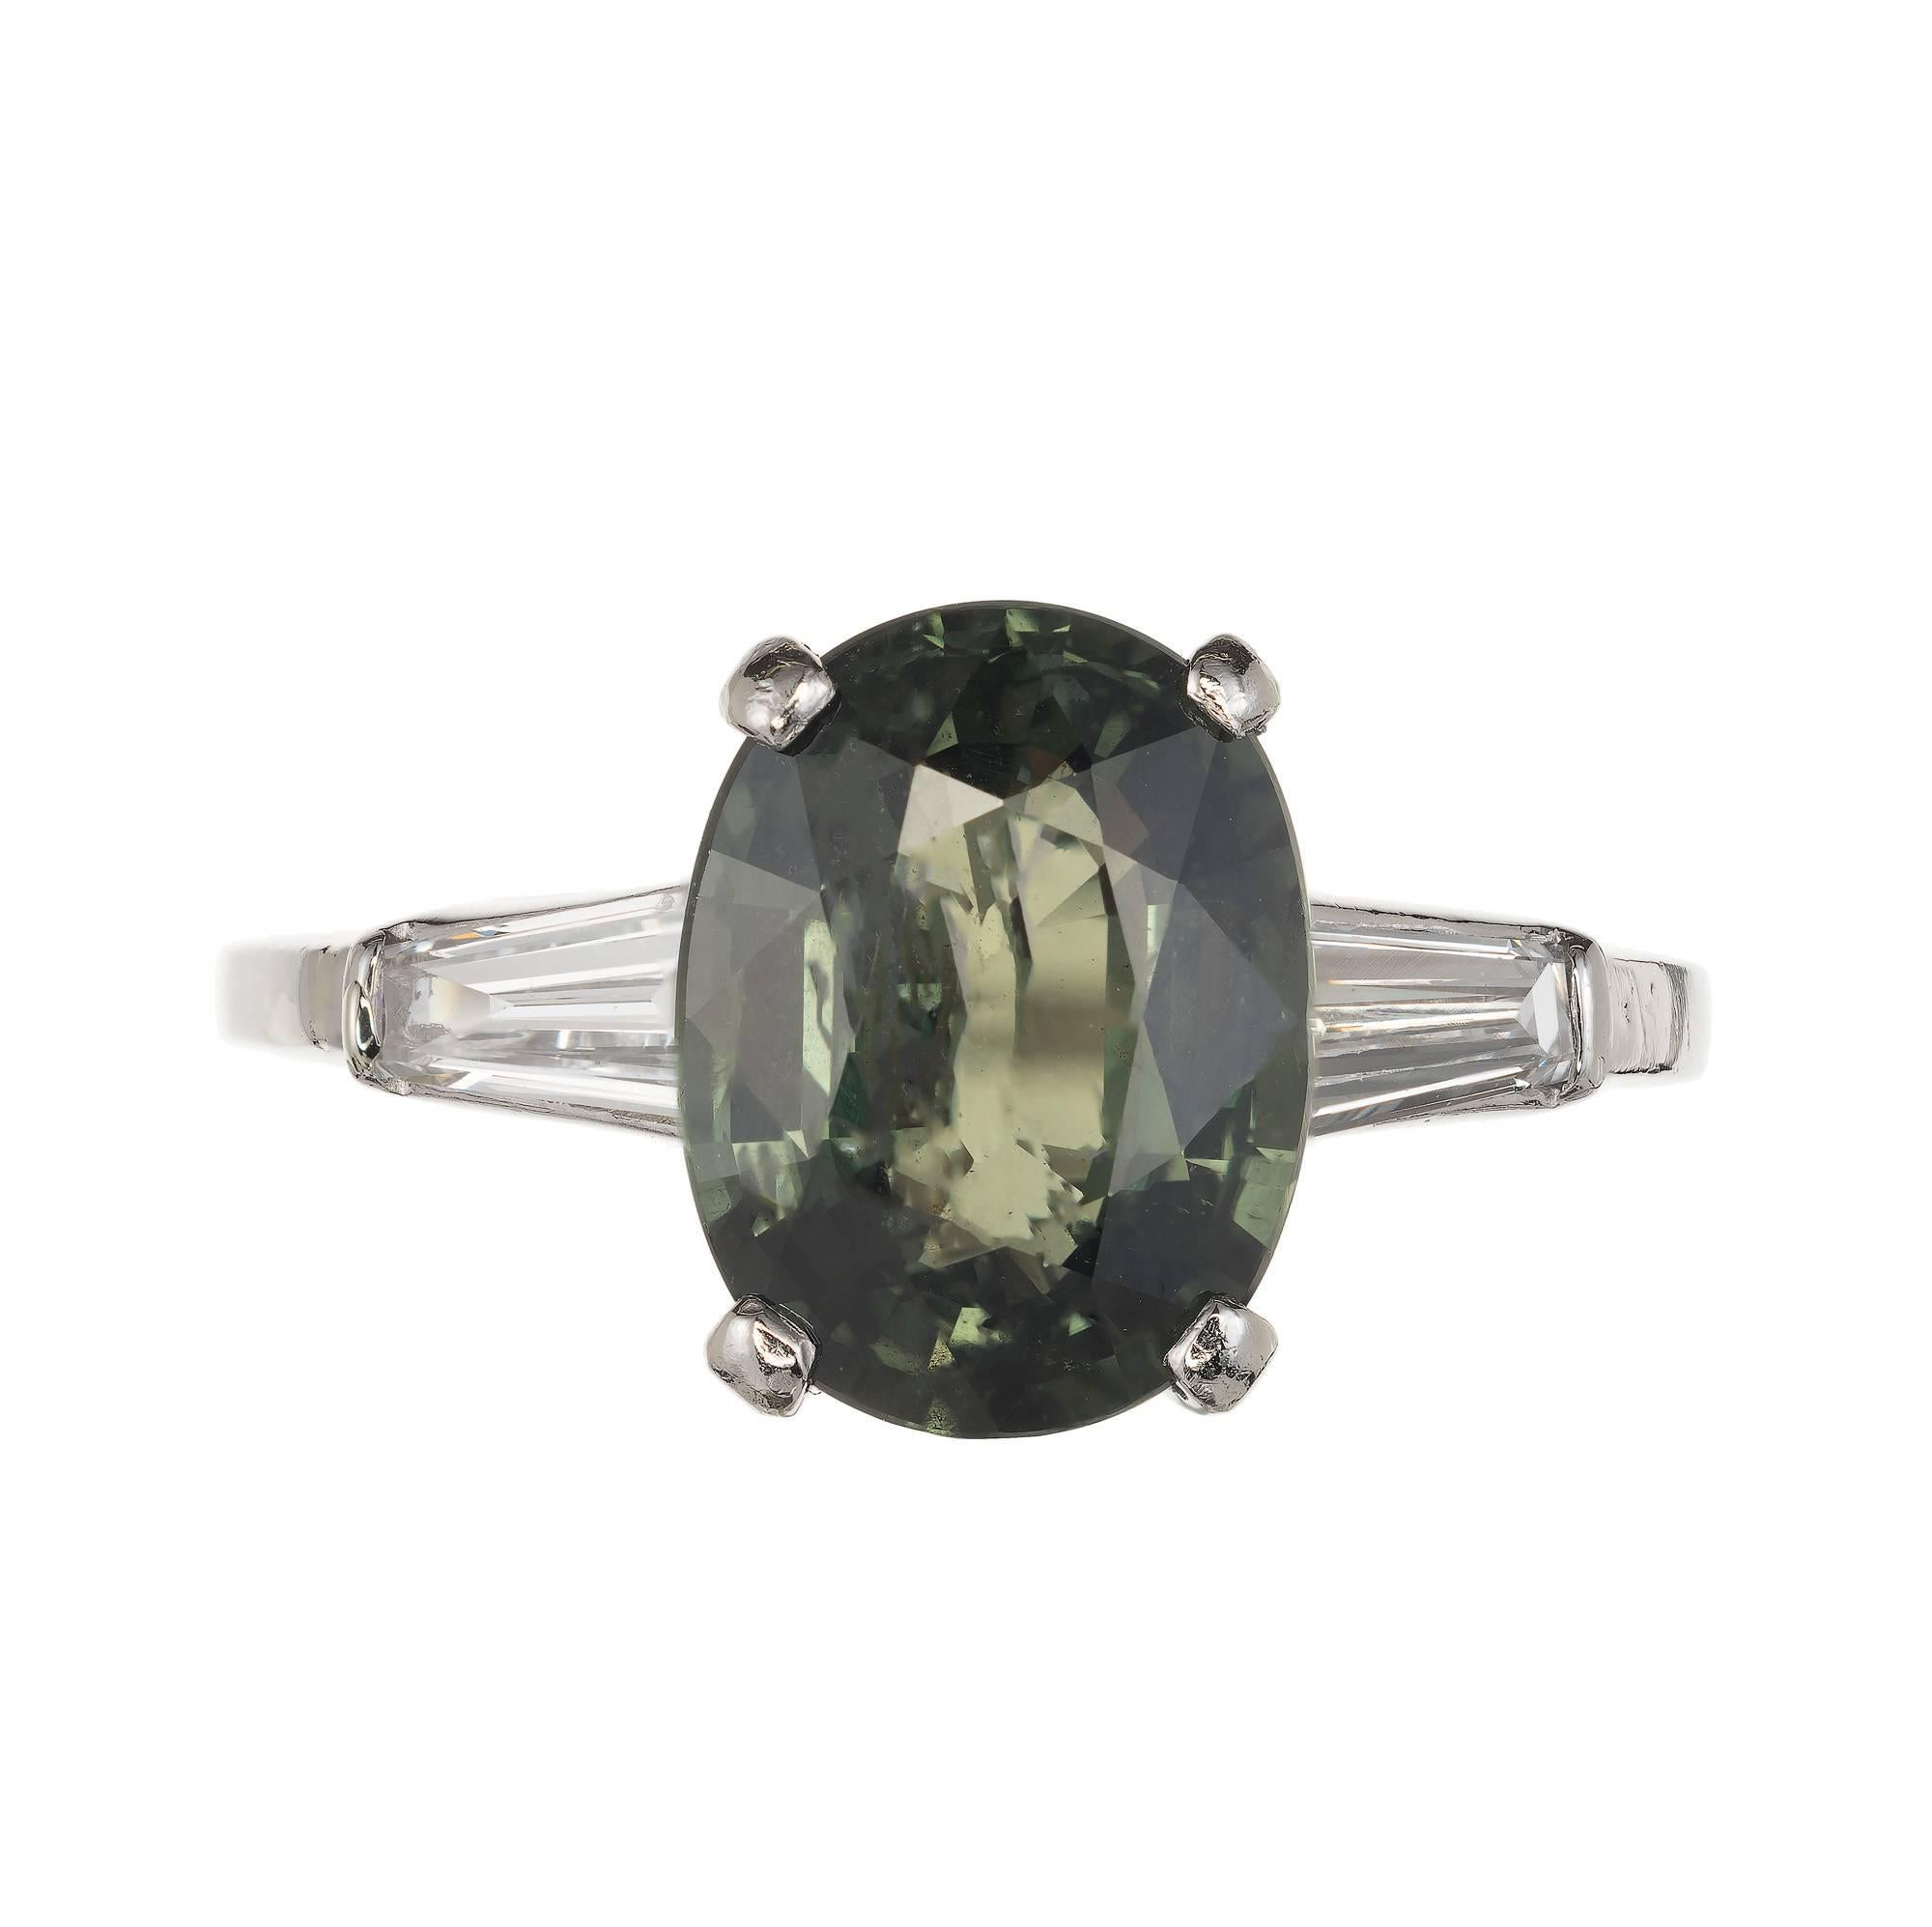 GIA Certified 3.80 Carat Natural Green Sapphire Diamond Platinum Engagement Ring